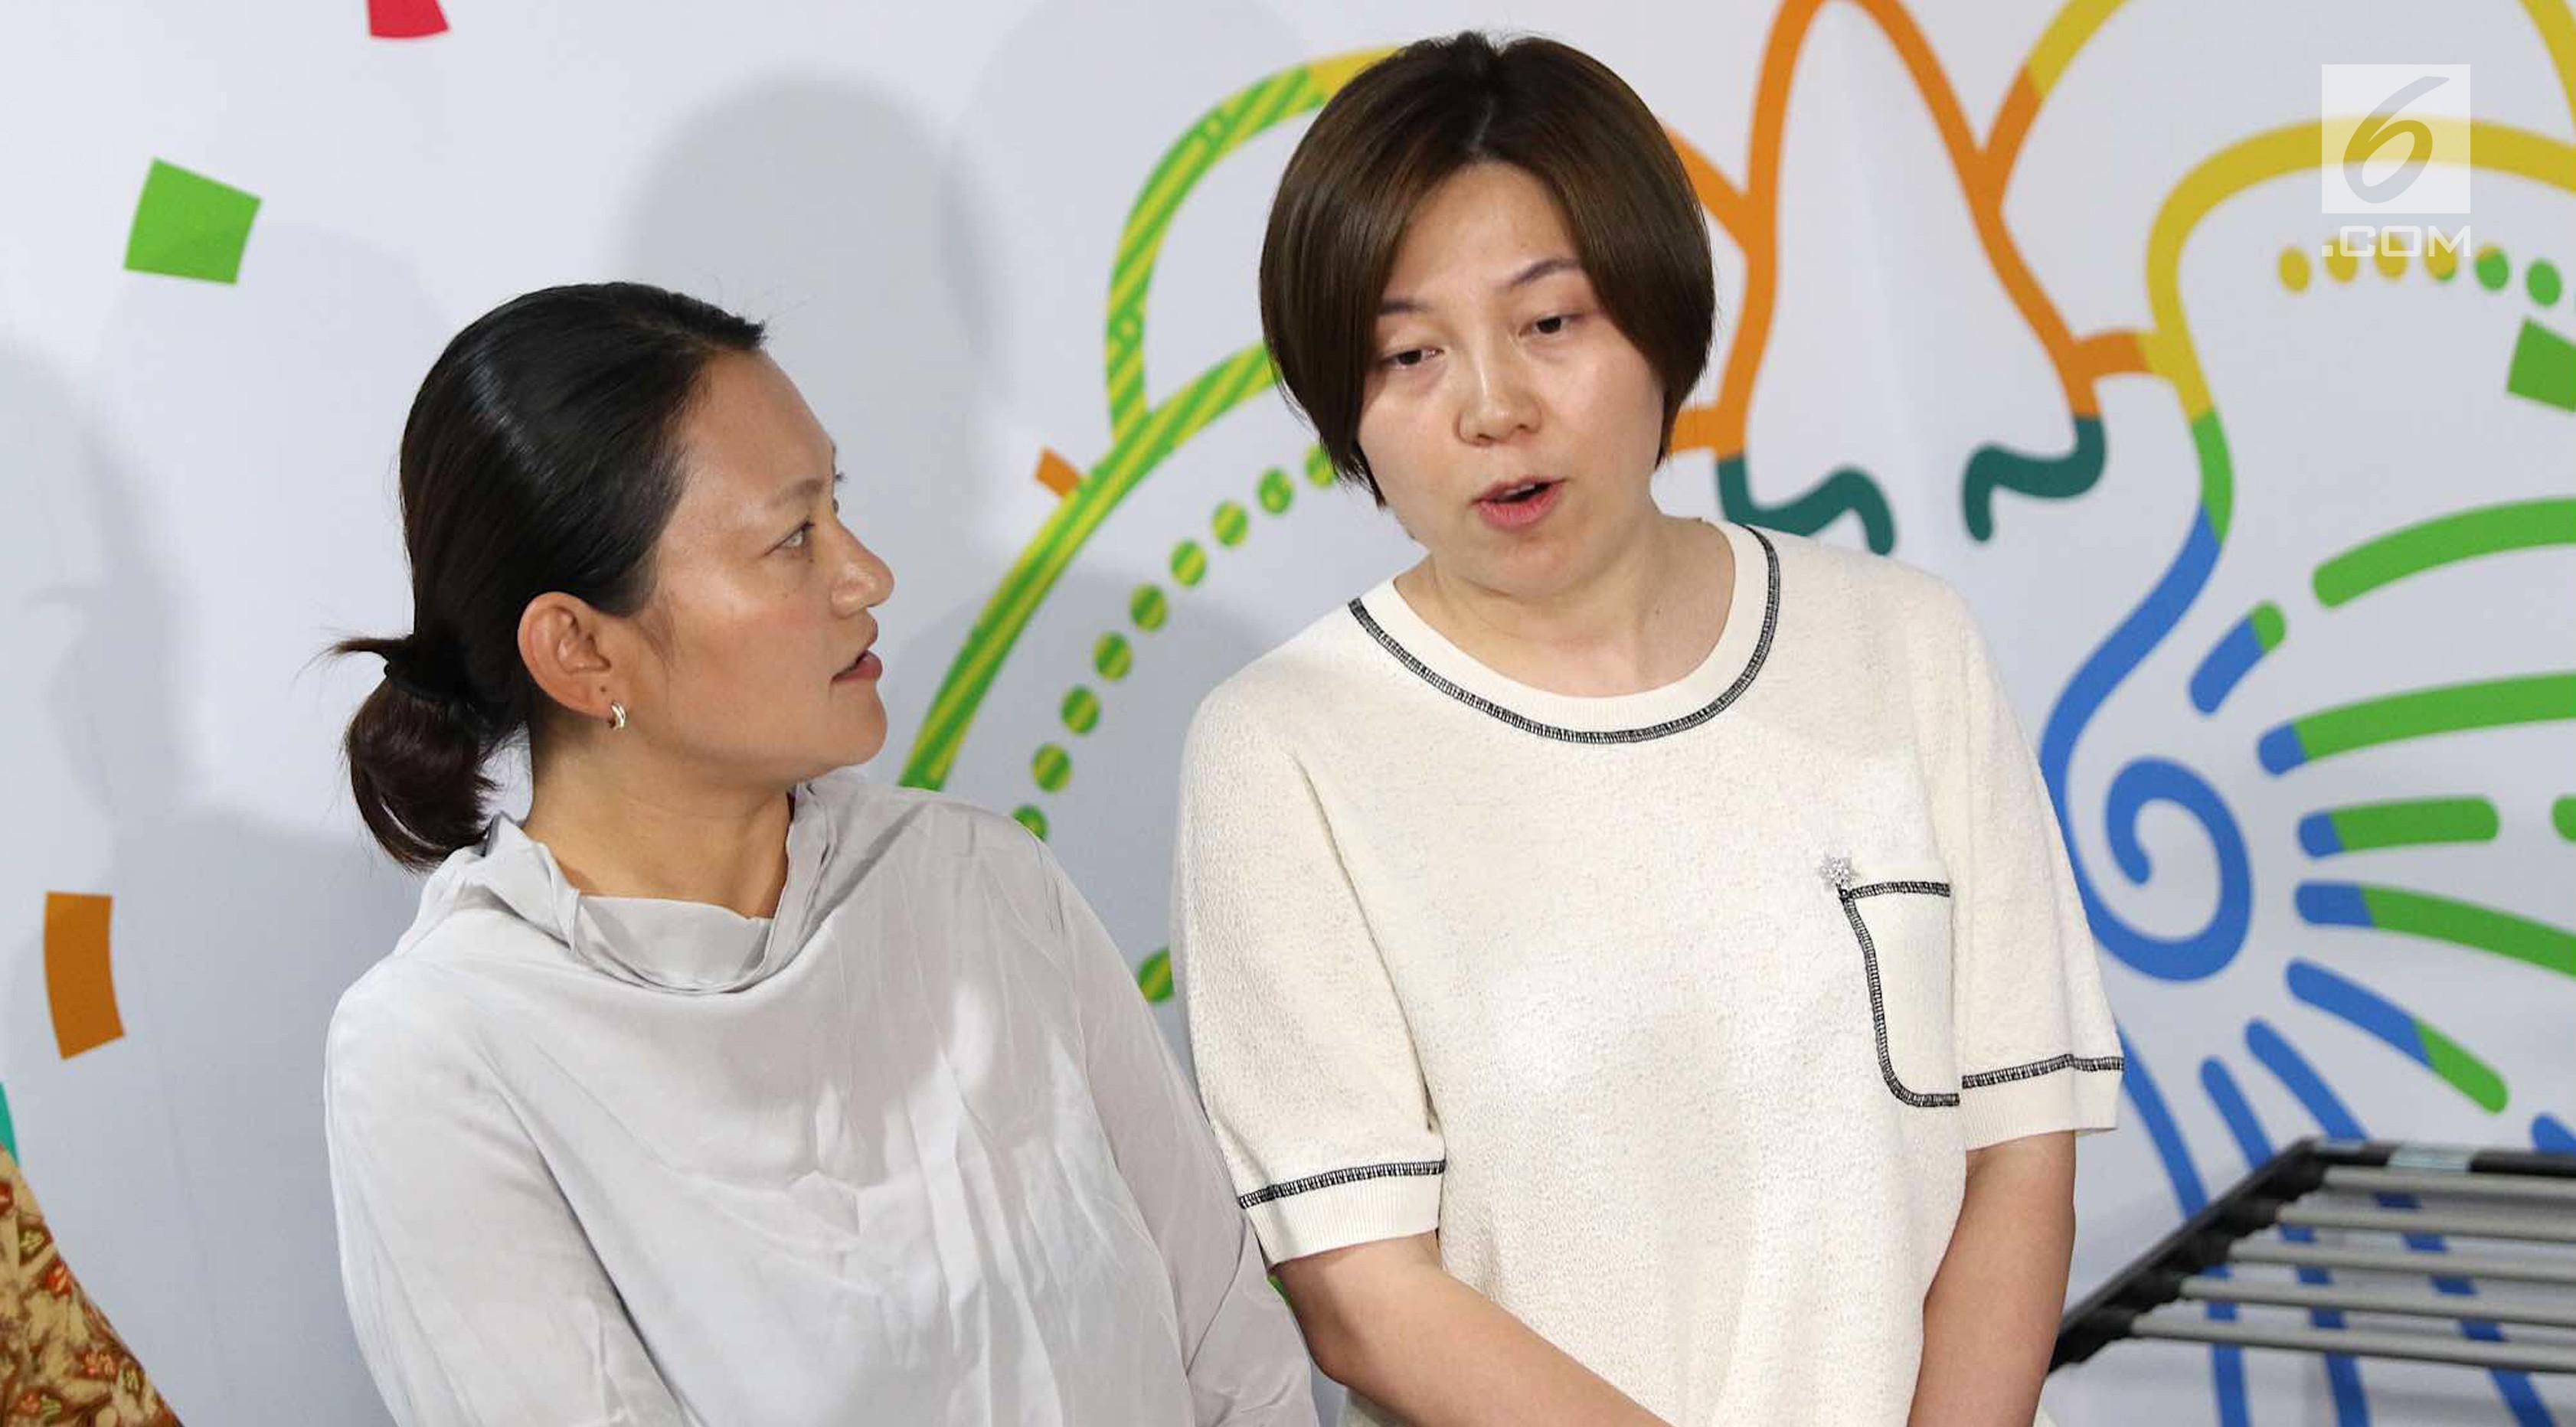 SVP Bytedance Zhen Liu (kiri) bersama SVP dan CEO Tik Tok Kelly Zhang saat mendatangi Kantor Kemenkominfo di Jakarta, Rabu (4/7). Tik Tok berkomitmen merubah batas usia penggunanya. (Liputan6.com/Immanuel Antonius)